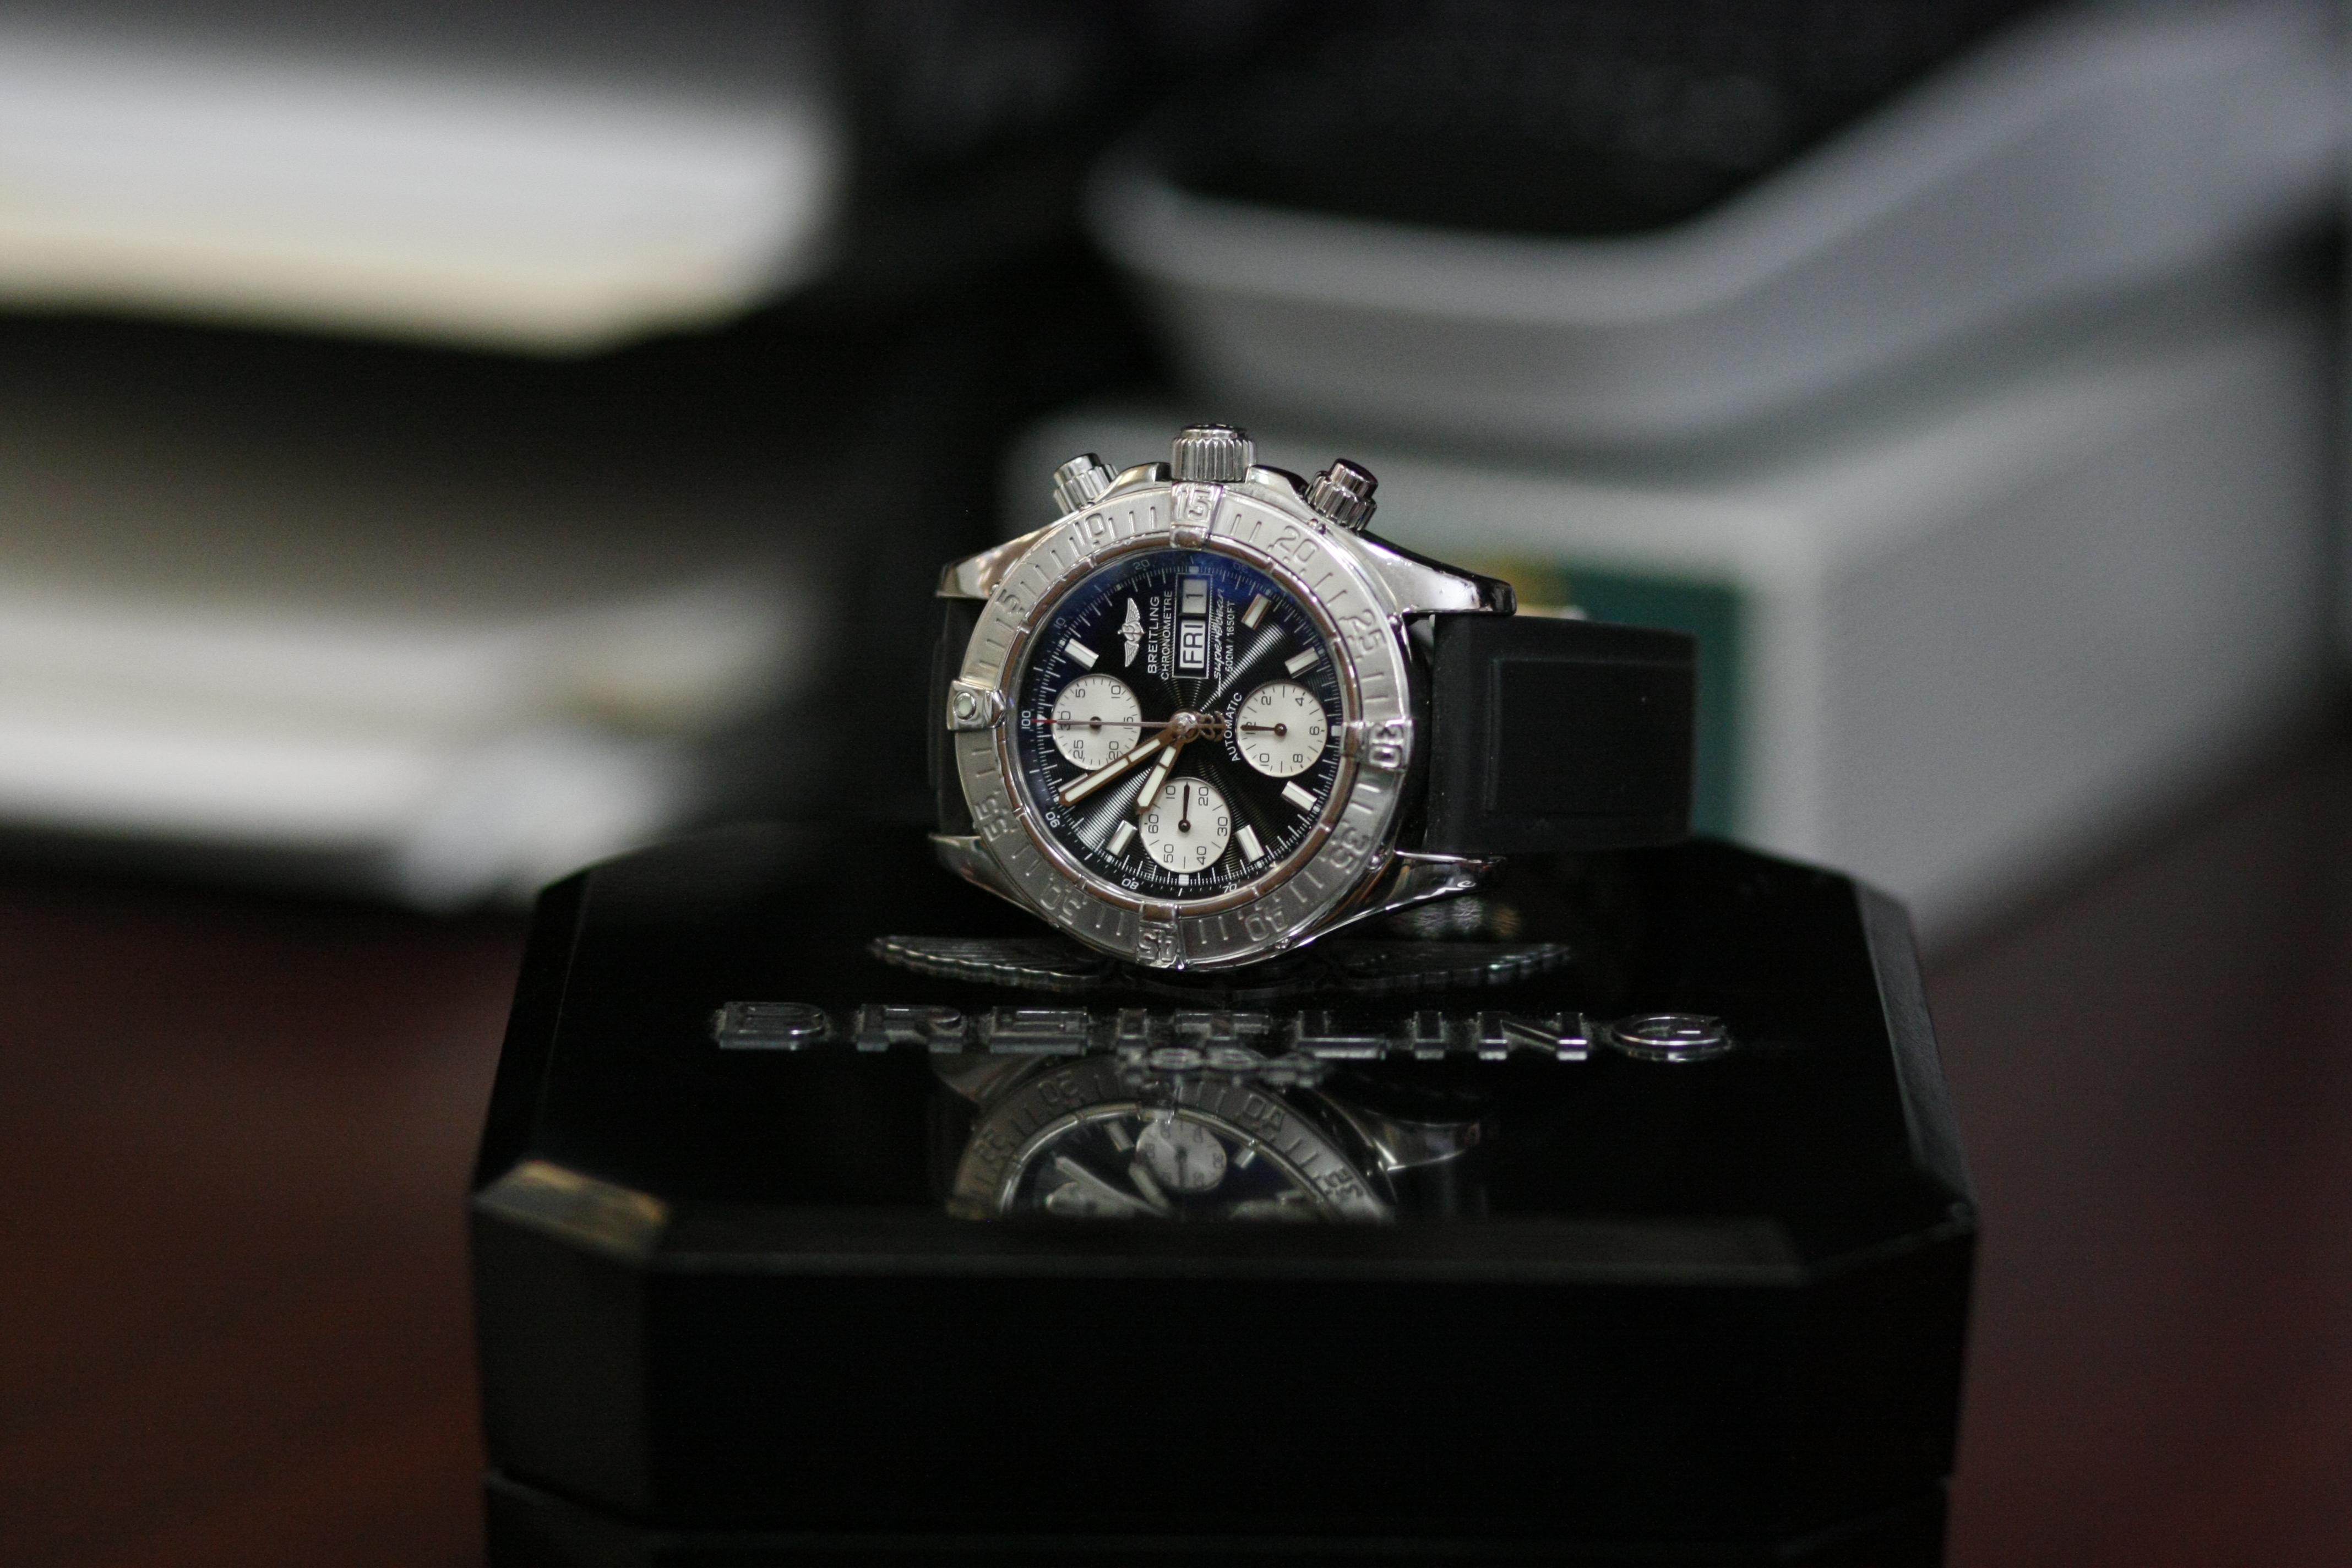 Breitling Superocean - $2,000